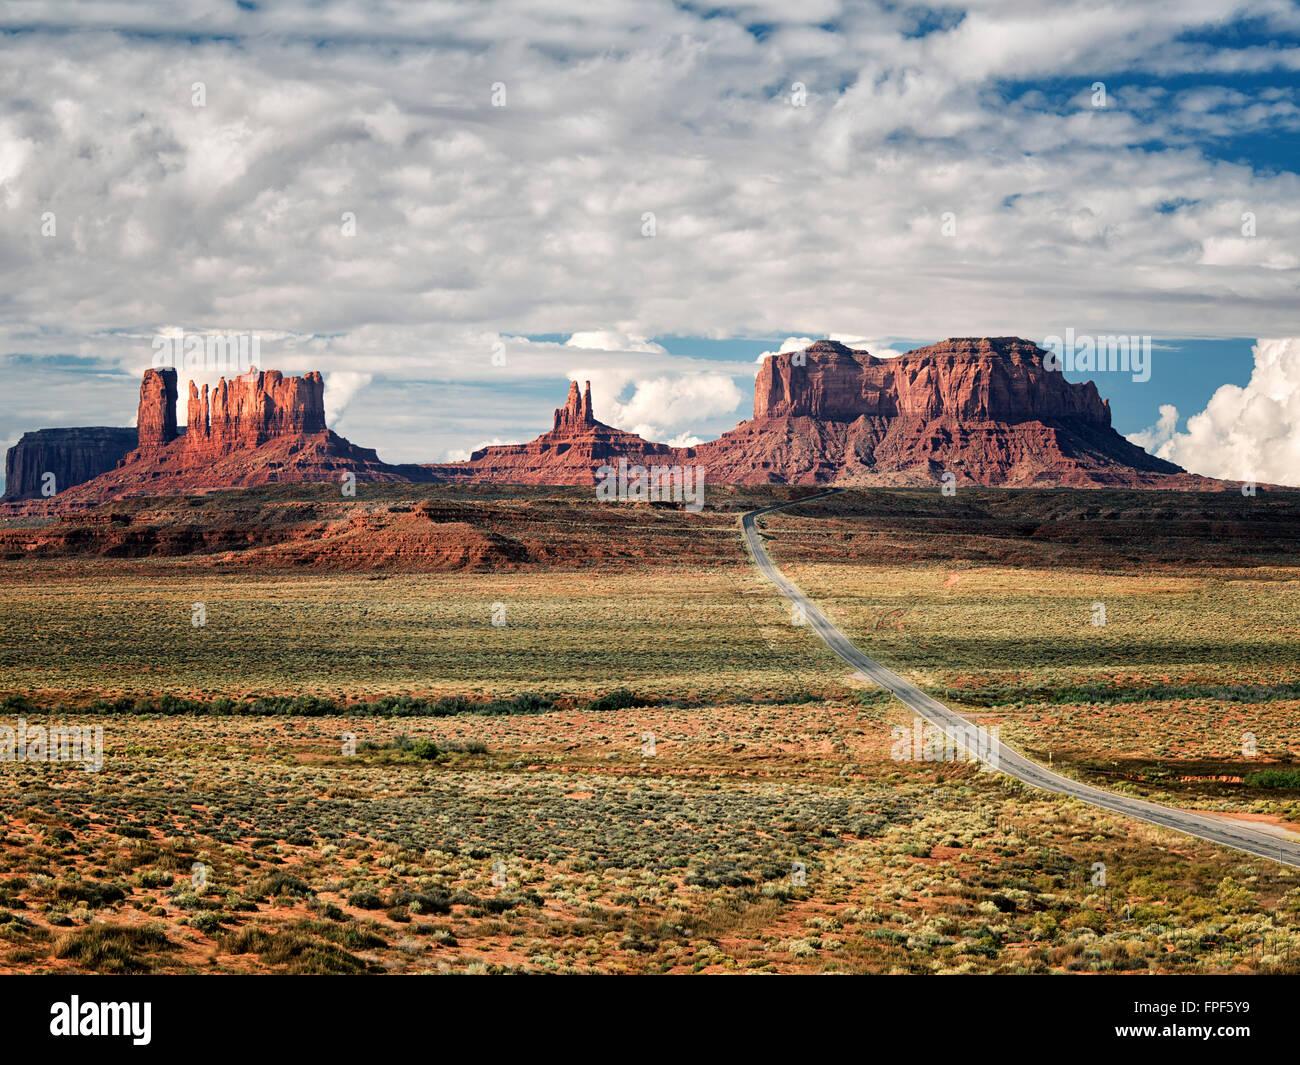 Highway leading to Monument Valley. Utah/Arizona - Stock Image